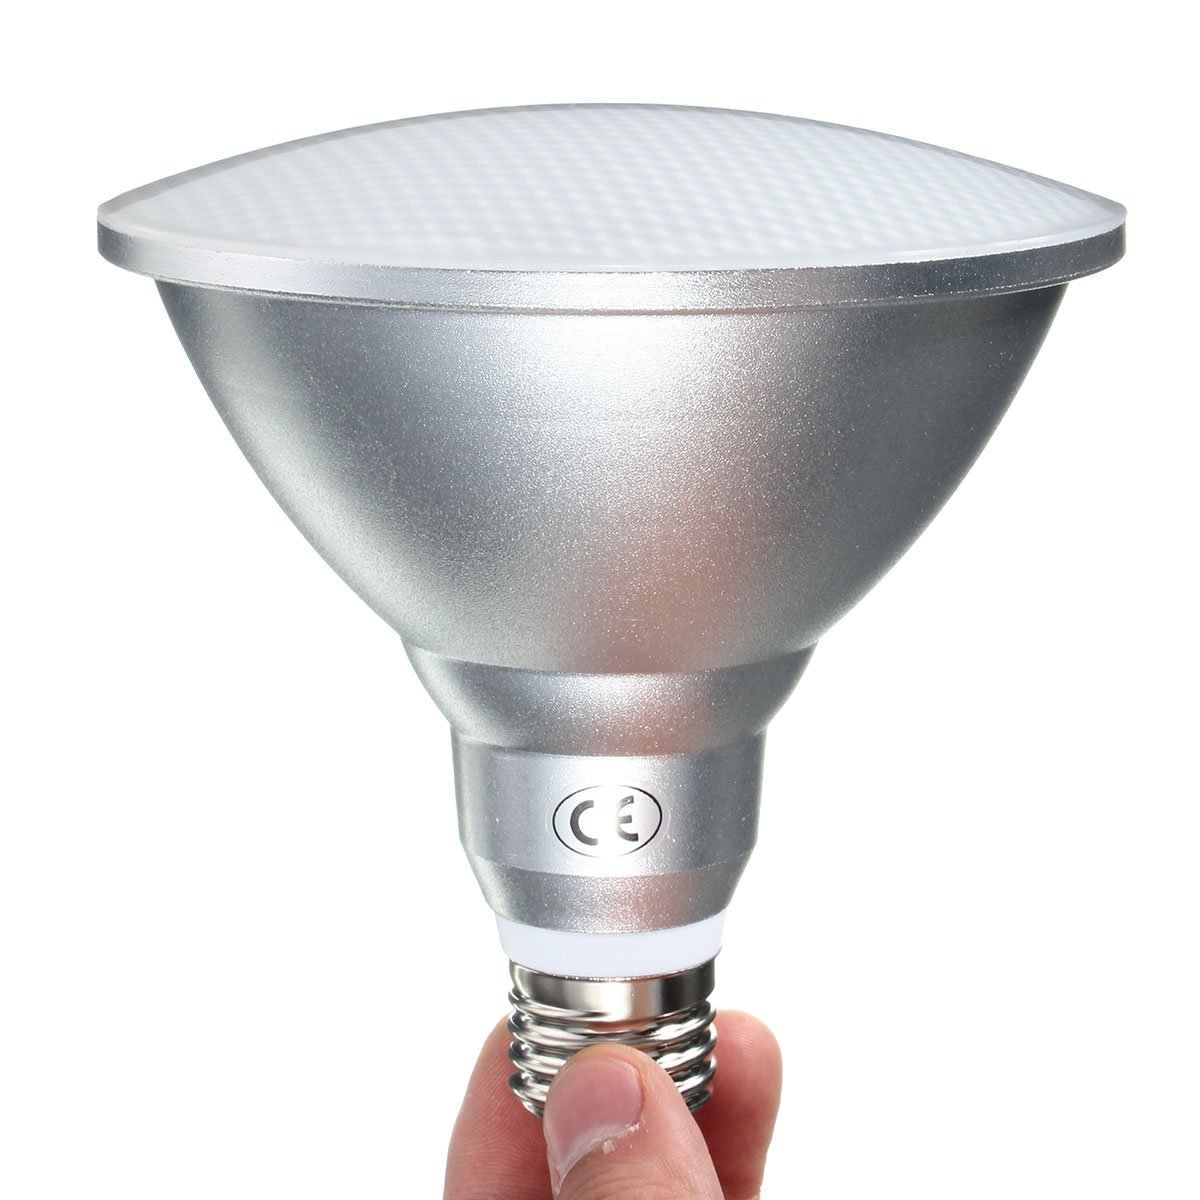 Dimmable E27 15w 900lm Led Spot Light Bulb Par38 Ip65 Lamp White Warm White Natural White Ac220v